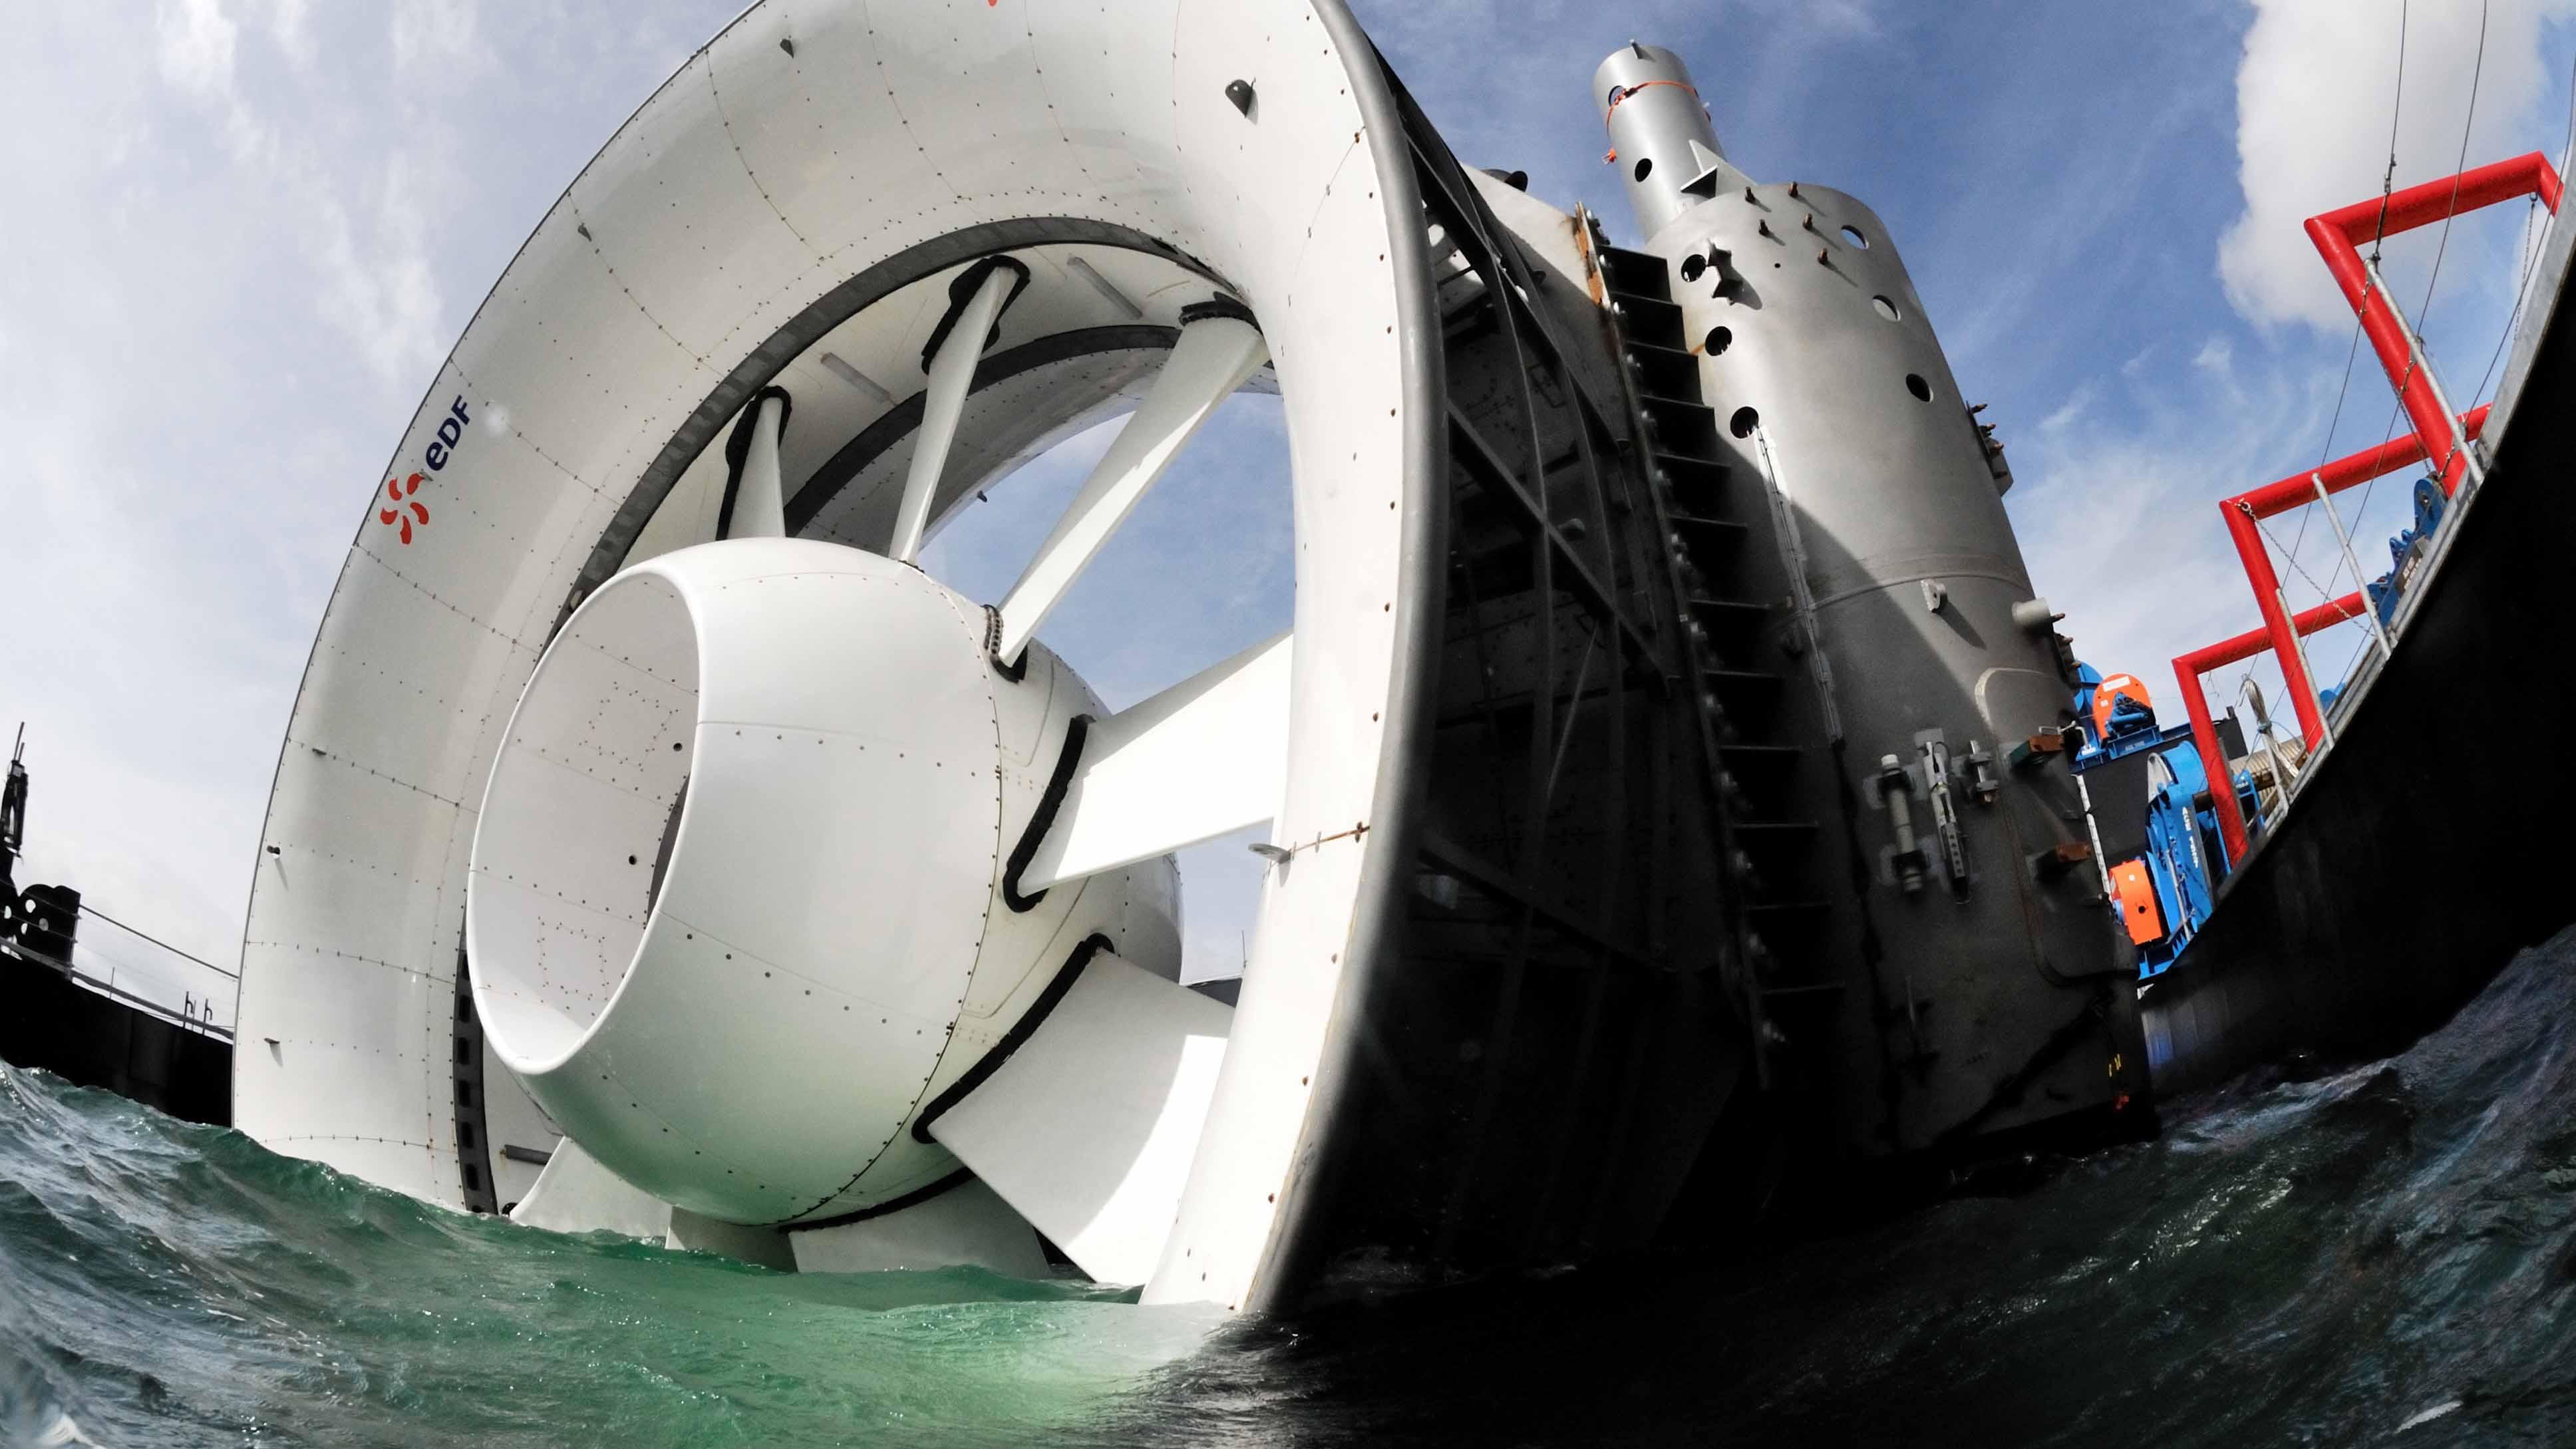 Tidal Stream Turbine Design at Sirehna